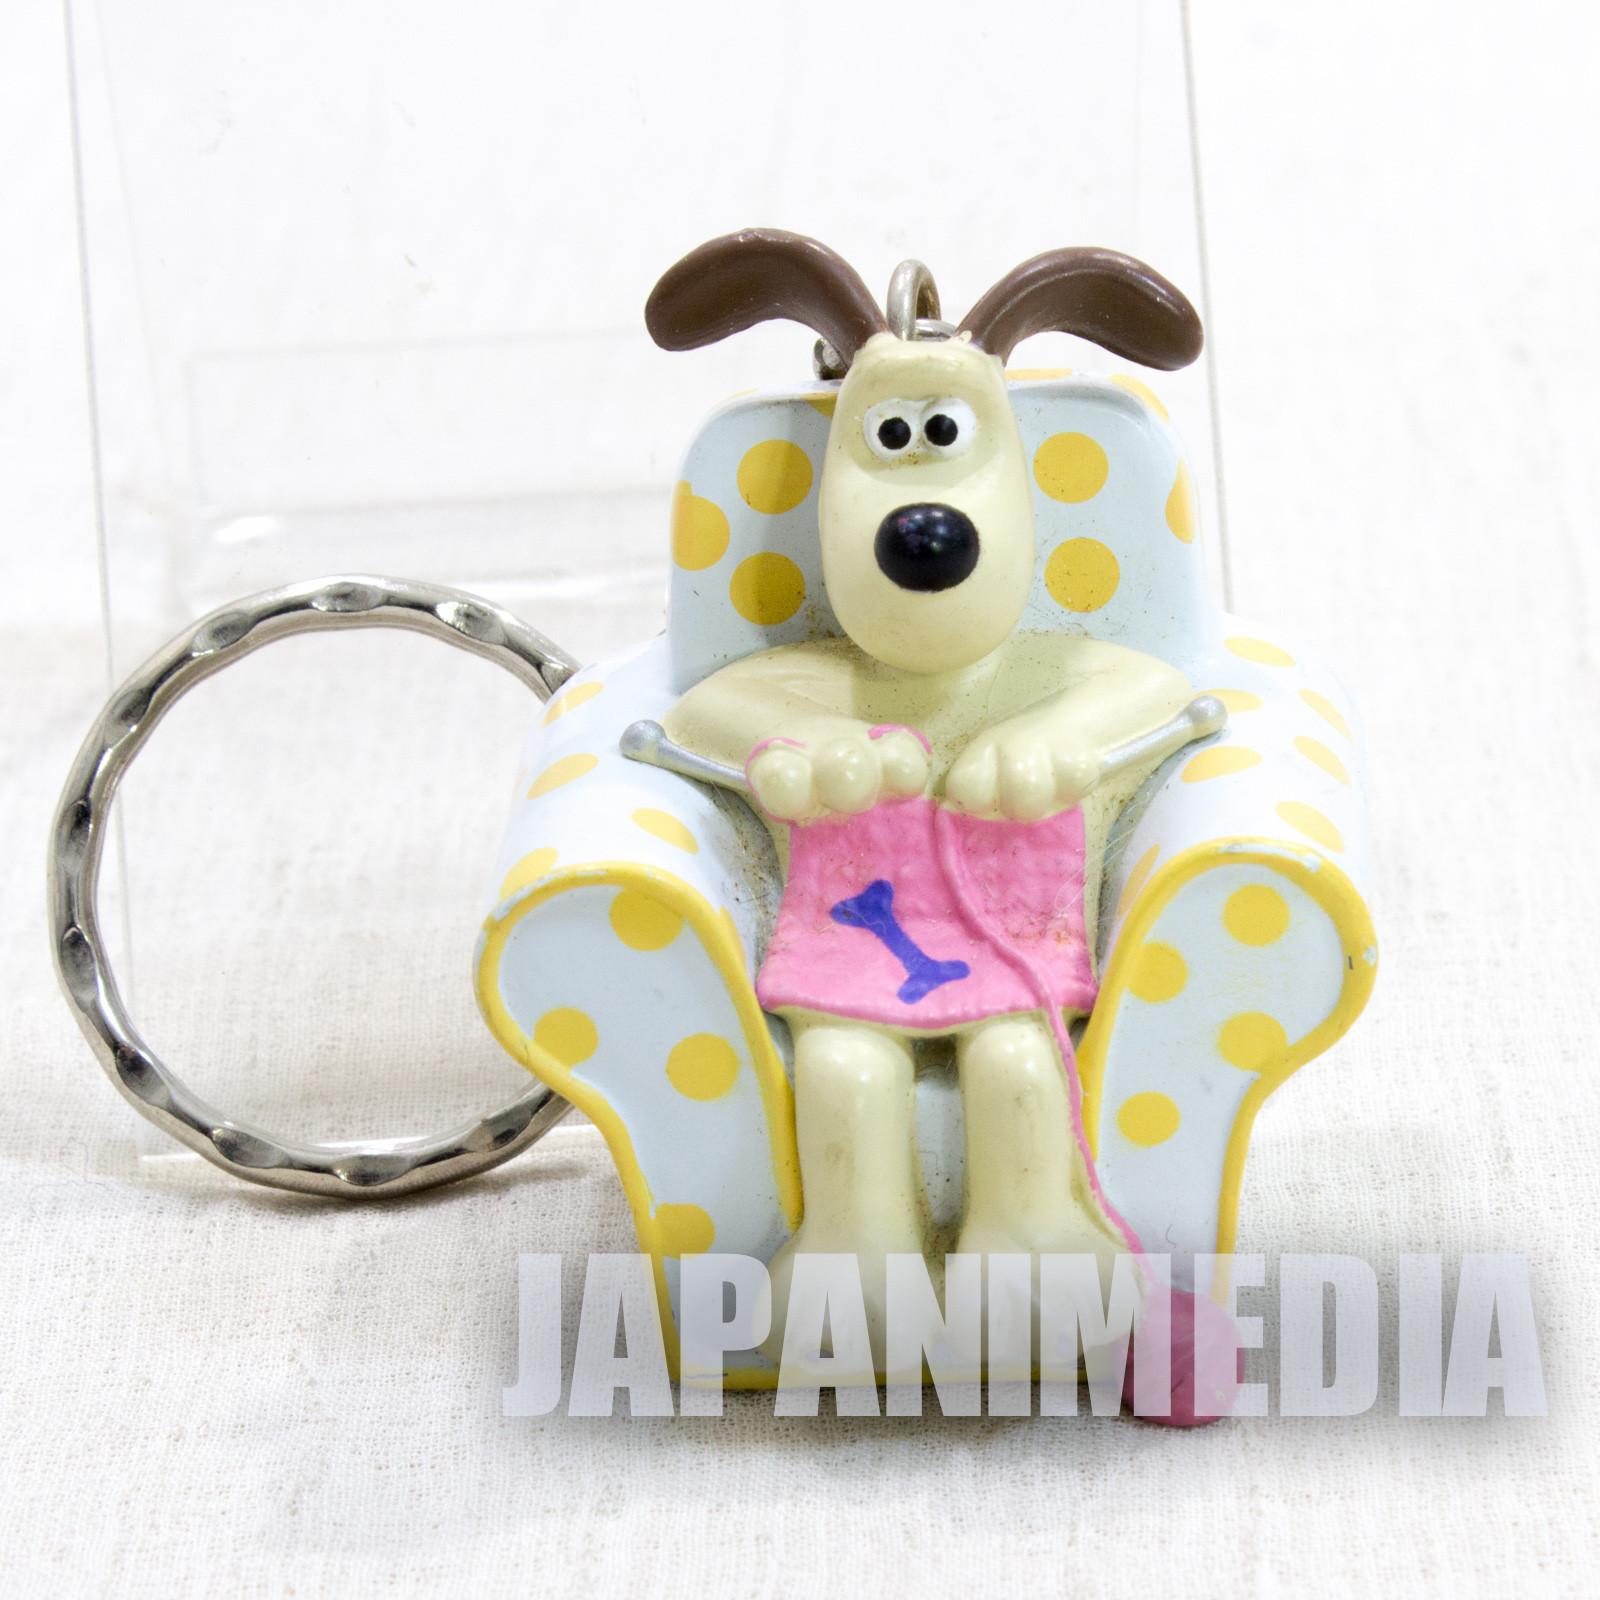 Wallace & Gromit Knitting on Sofa Figure Key Chain Banpresto JAPAN Ardman ANIME [No Package]